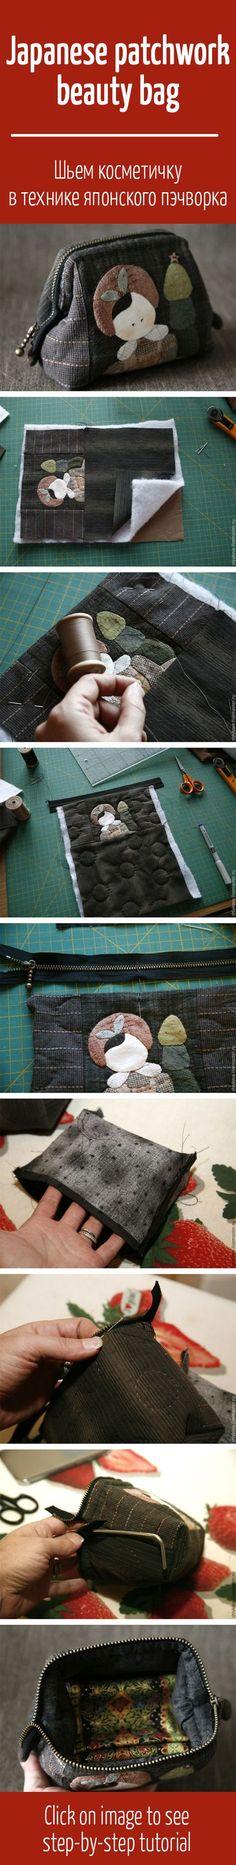 Japanese patchwork beauty bag / Шьем косметичкув технике японского пэчворка